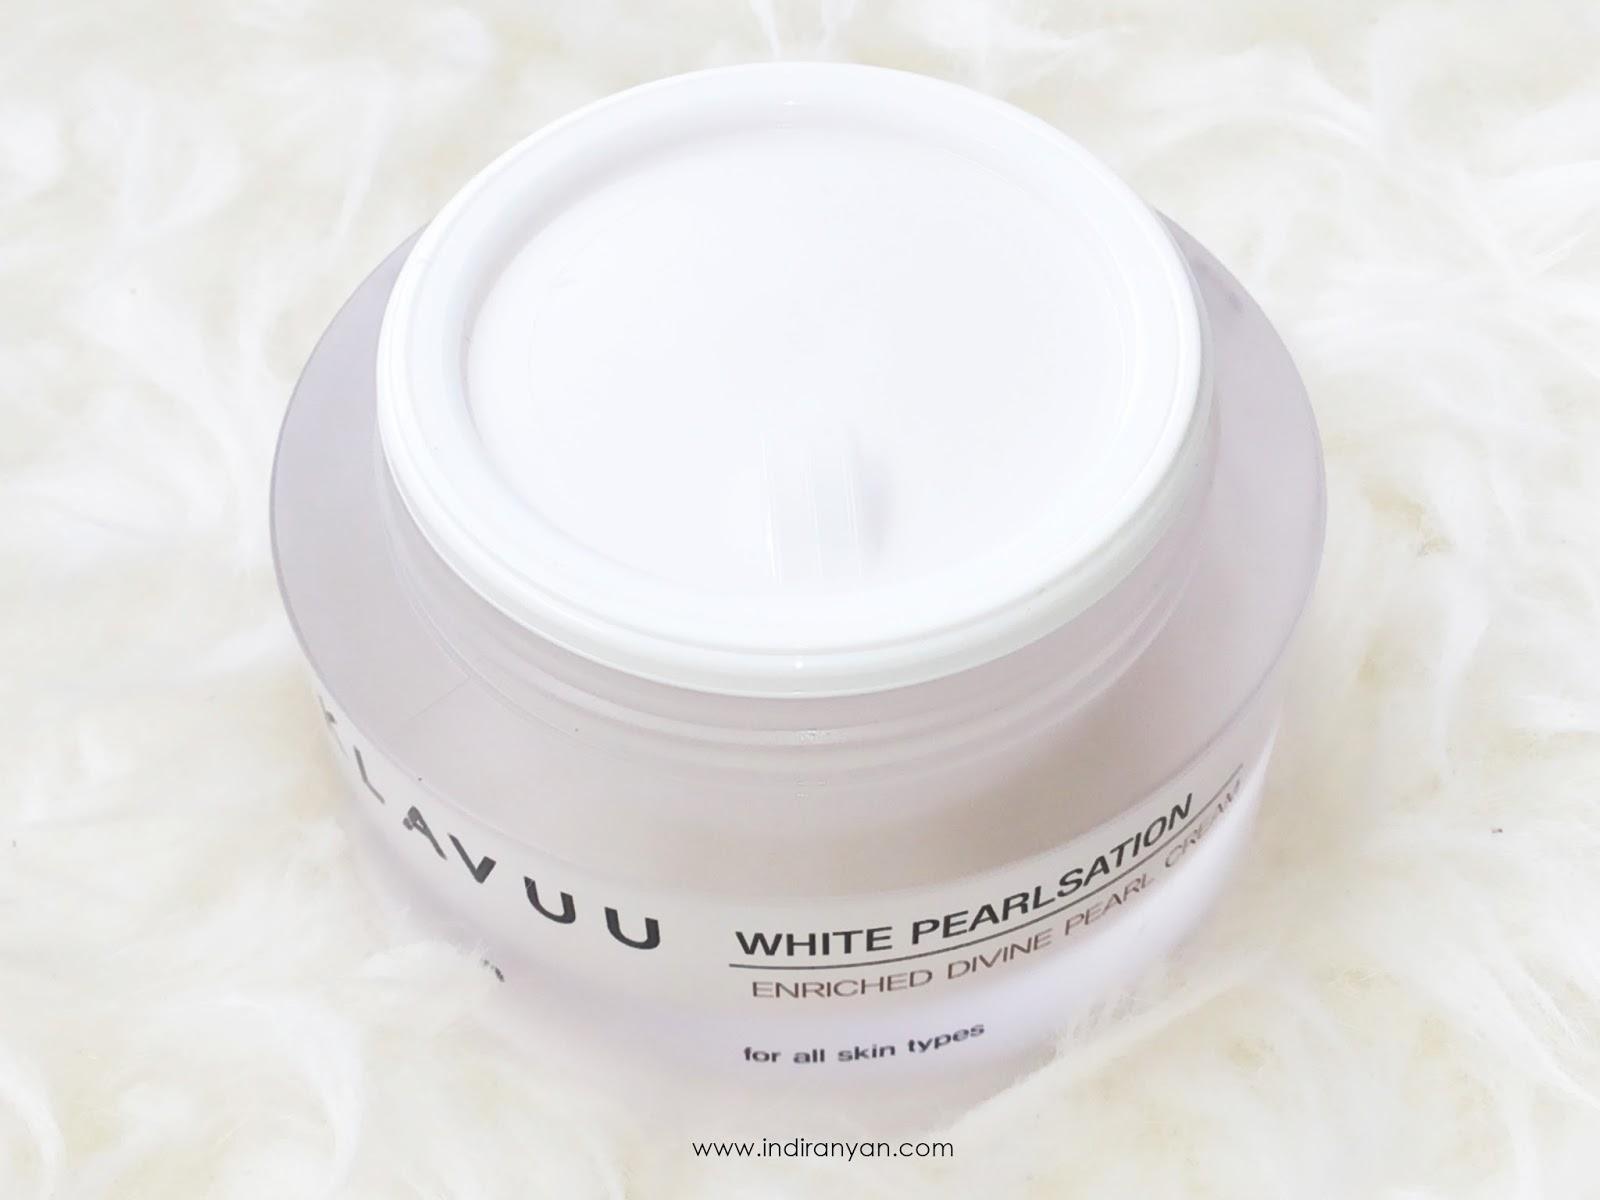 review-klavuu-white-pearlsation-enriched-divine-pearl-cream